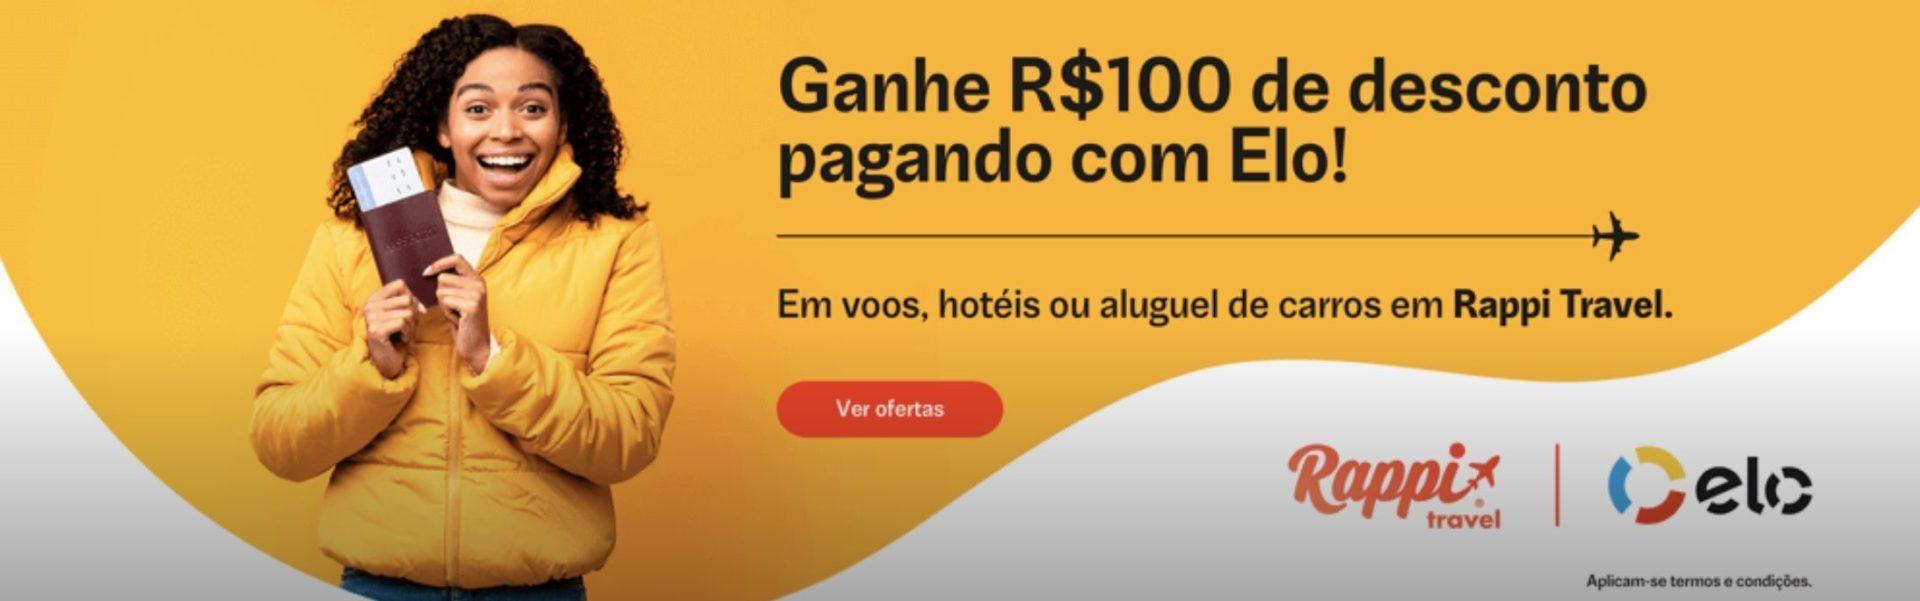 Rappi Travel Elo R$100